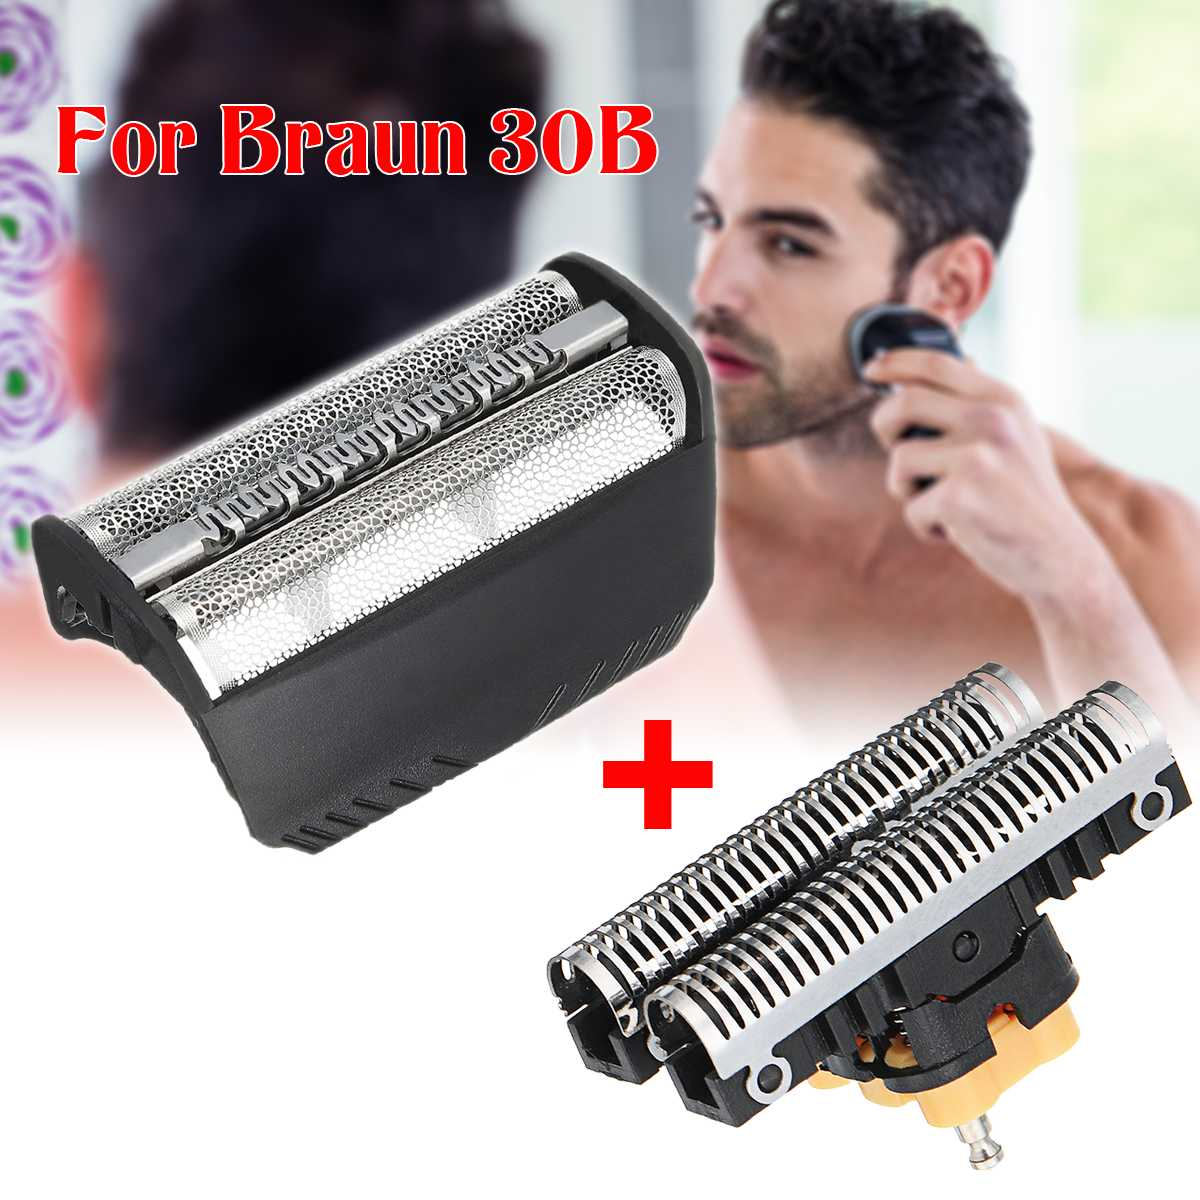 2pcs/set Replacement Shaver Foil + Cutter Blade for BRAUN 30B 310 330 340 4735 4736 4737 5491 5492 5746 7475 7493 7516 Razor